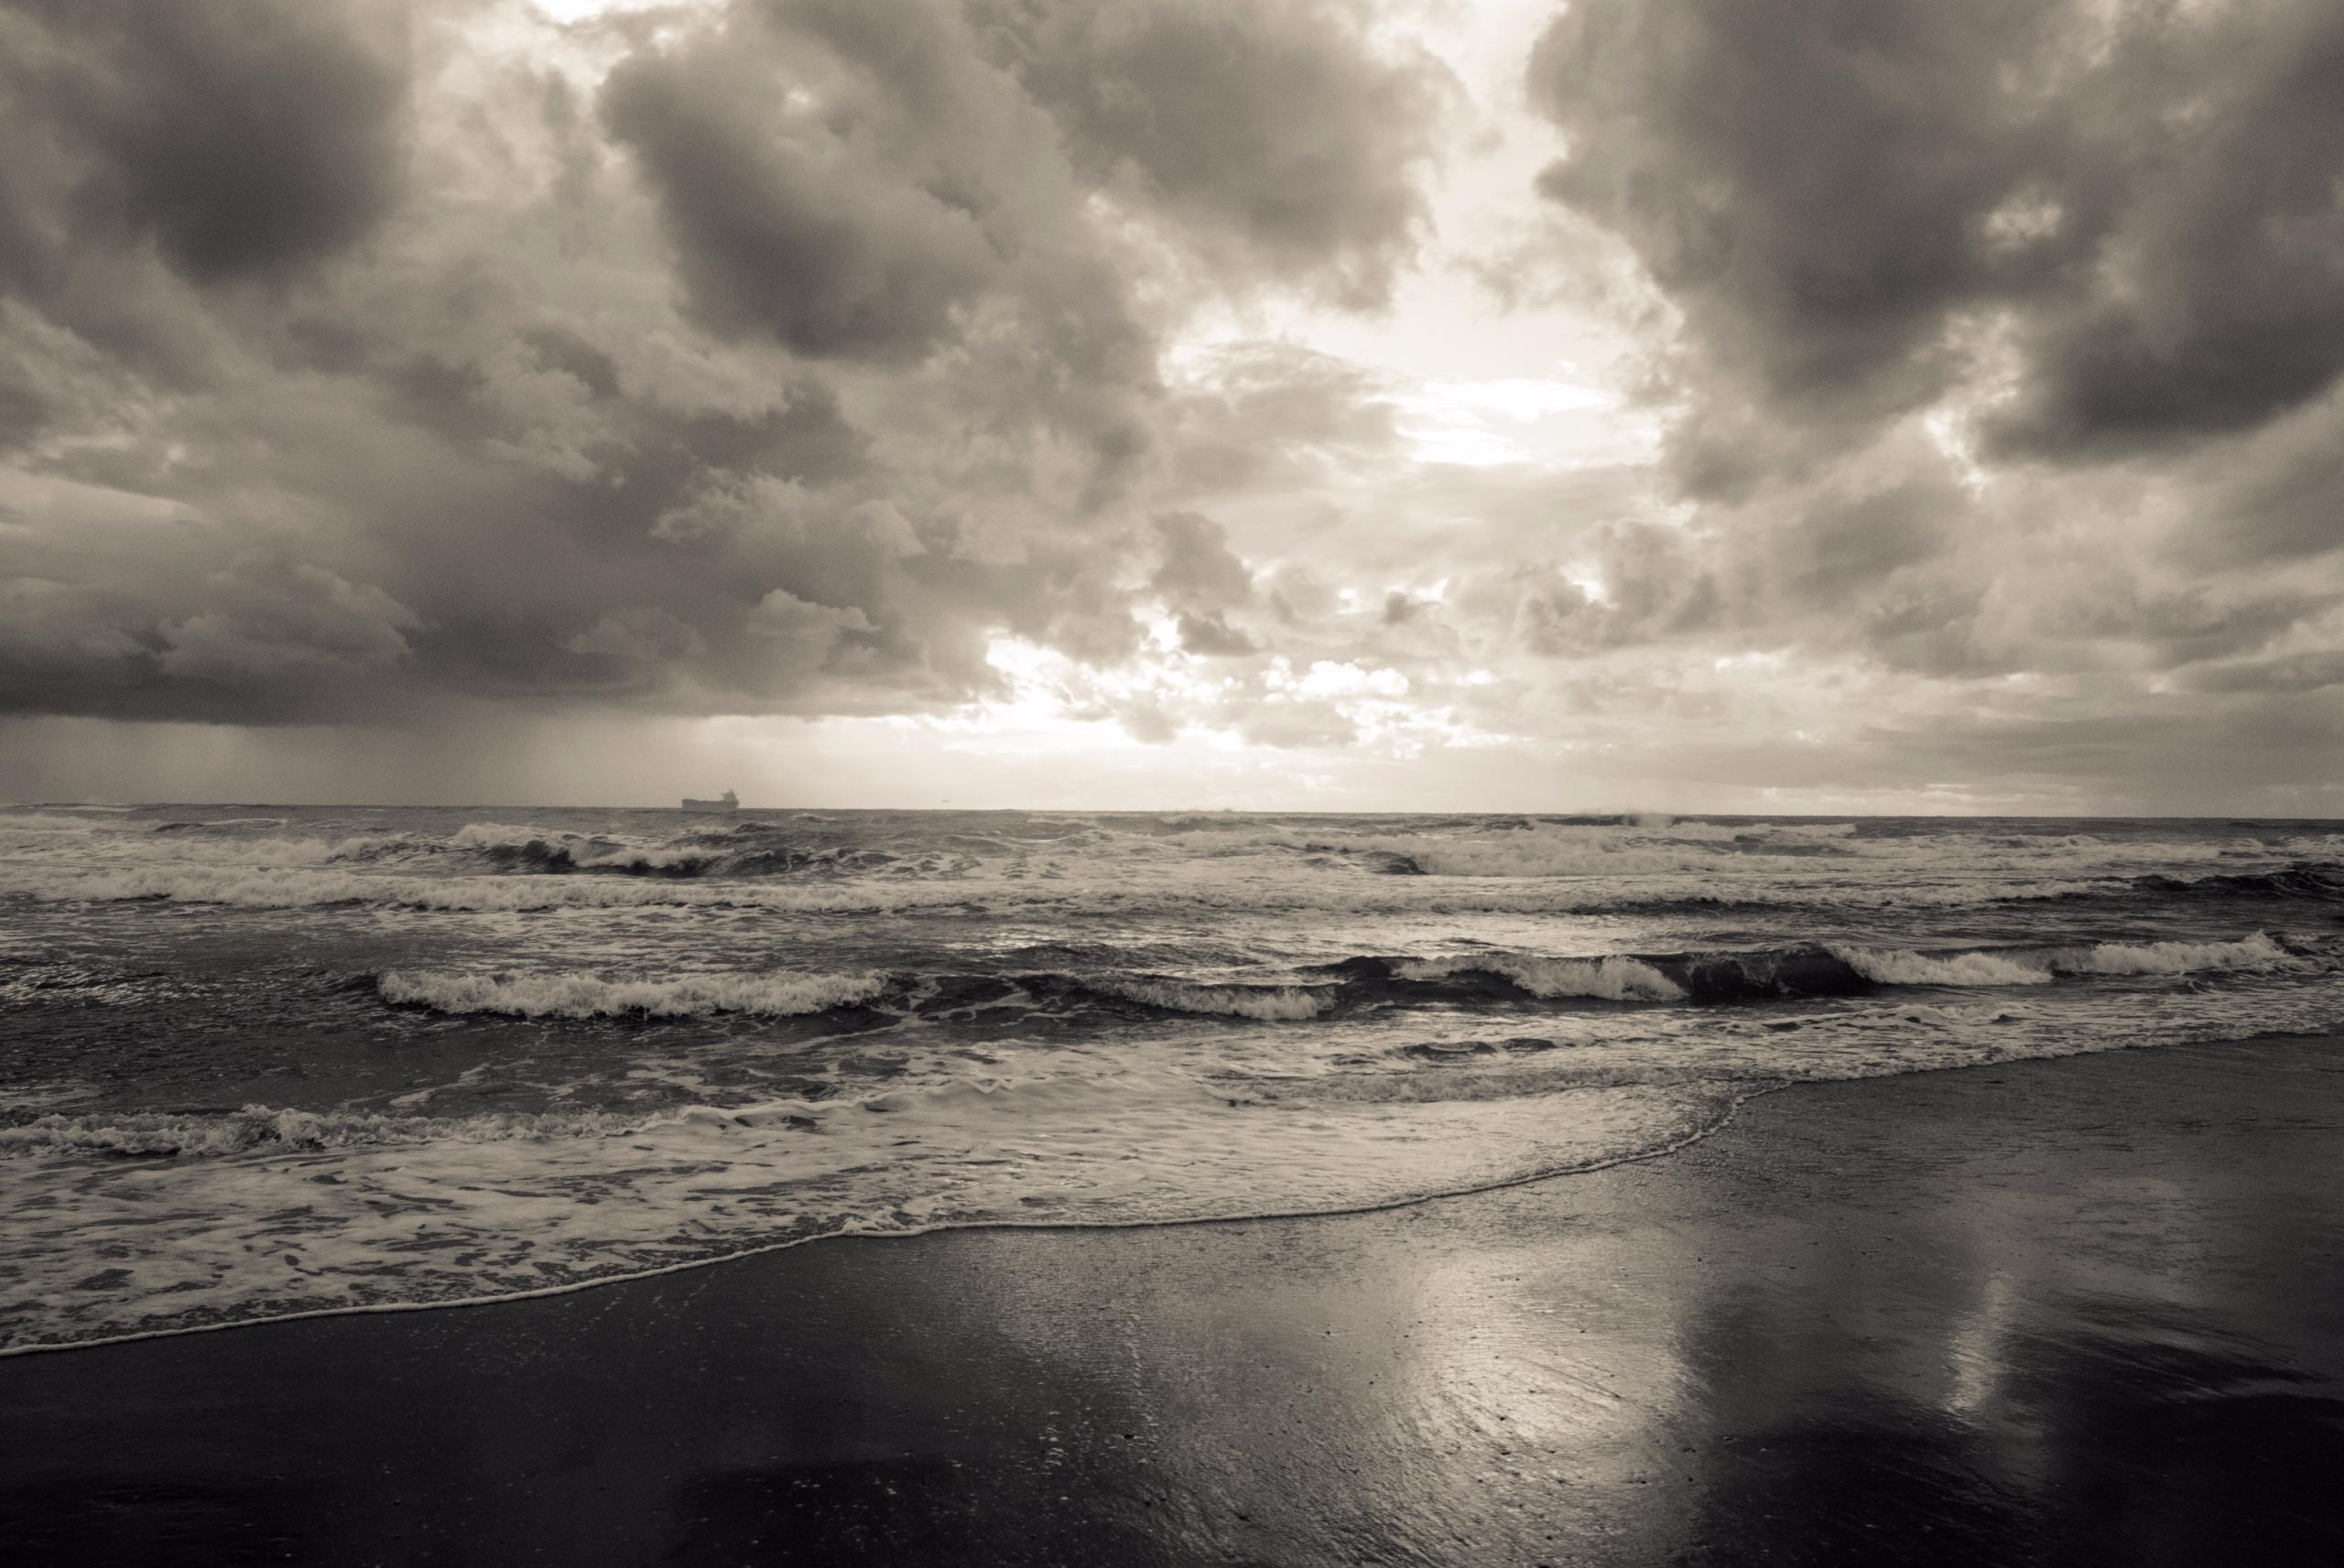 sea, beach, coast, ship, clouds - ydoron1   ello